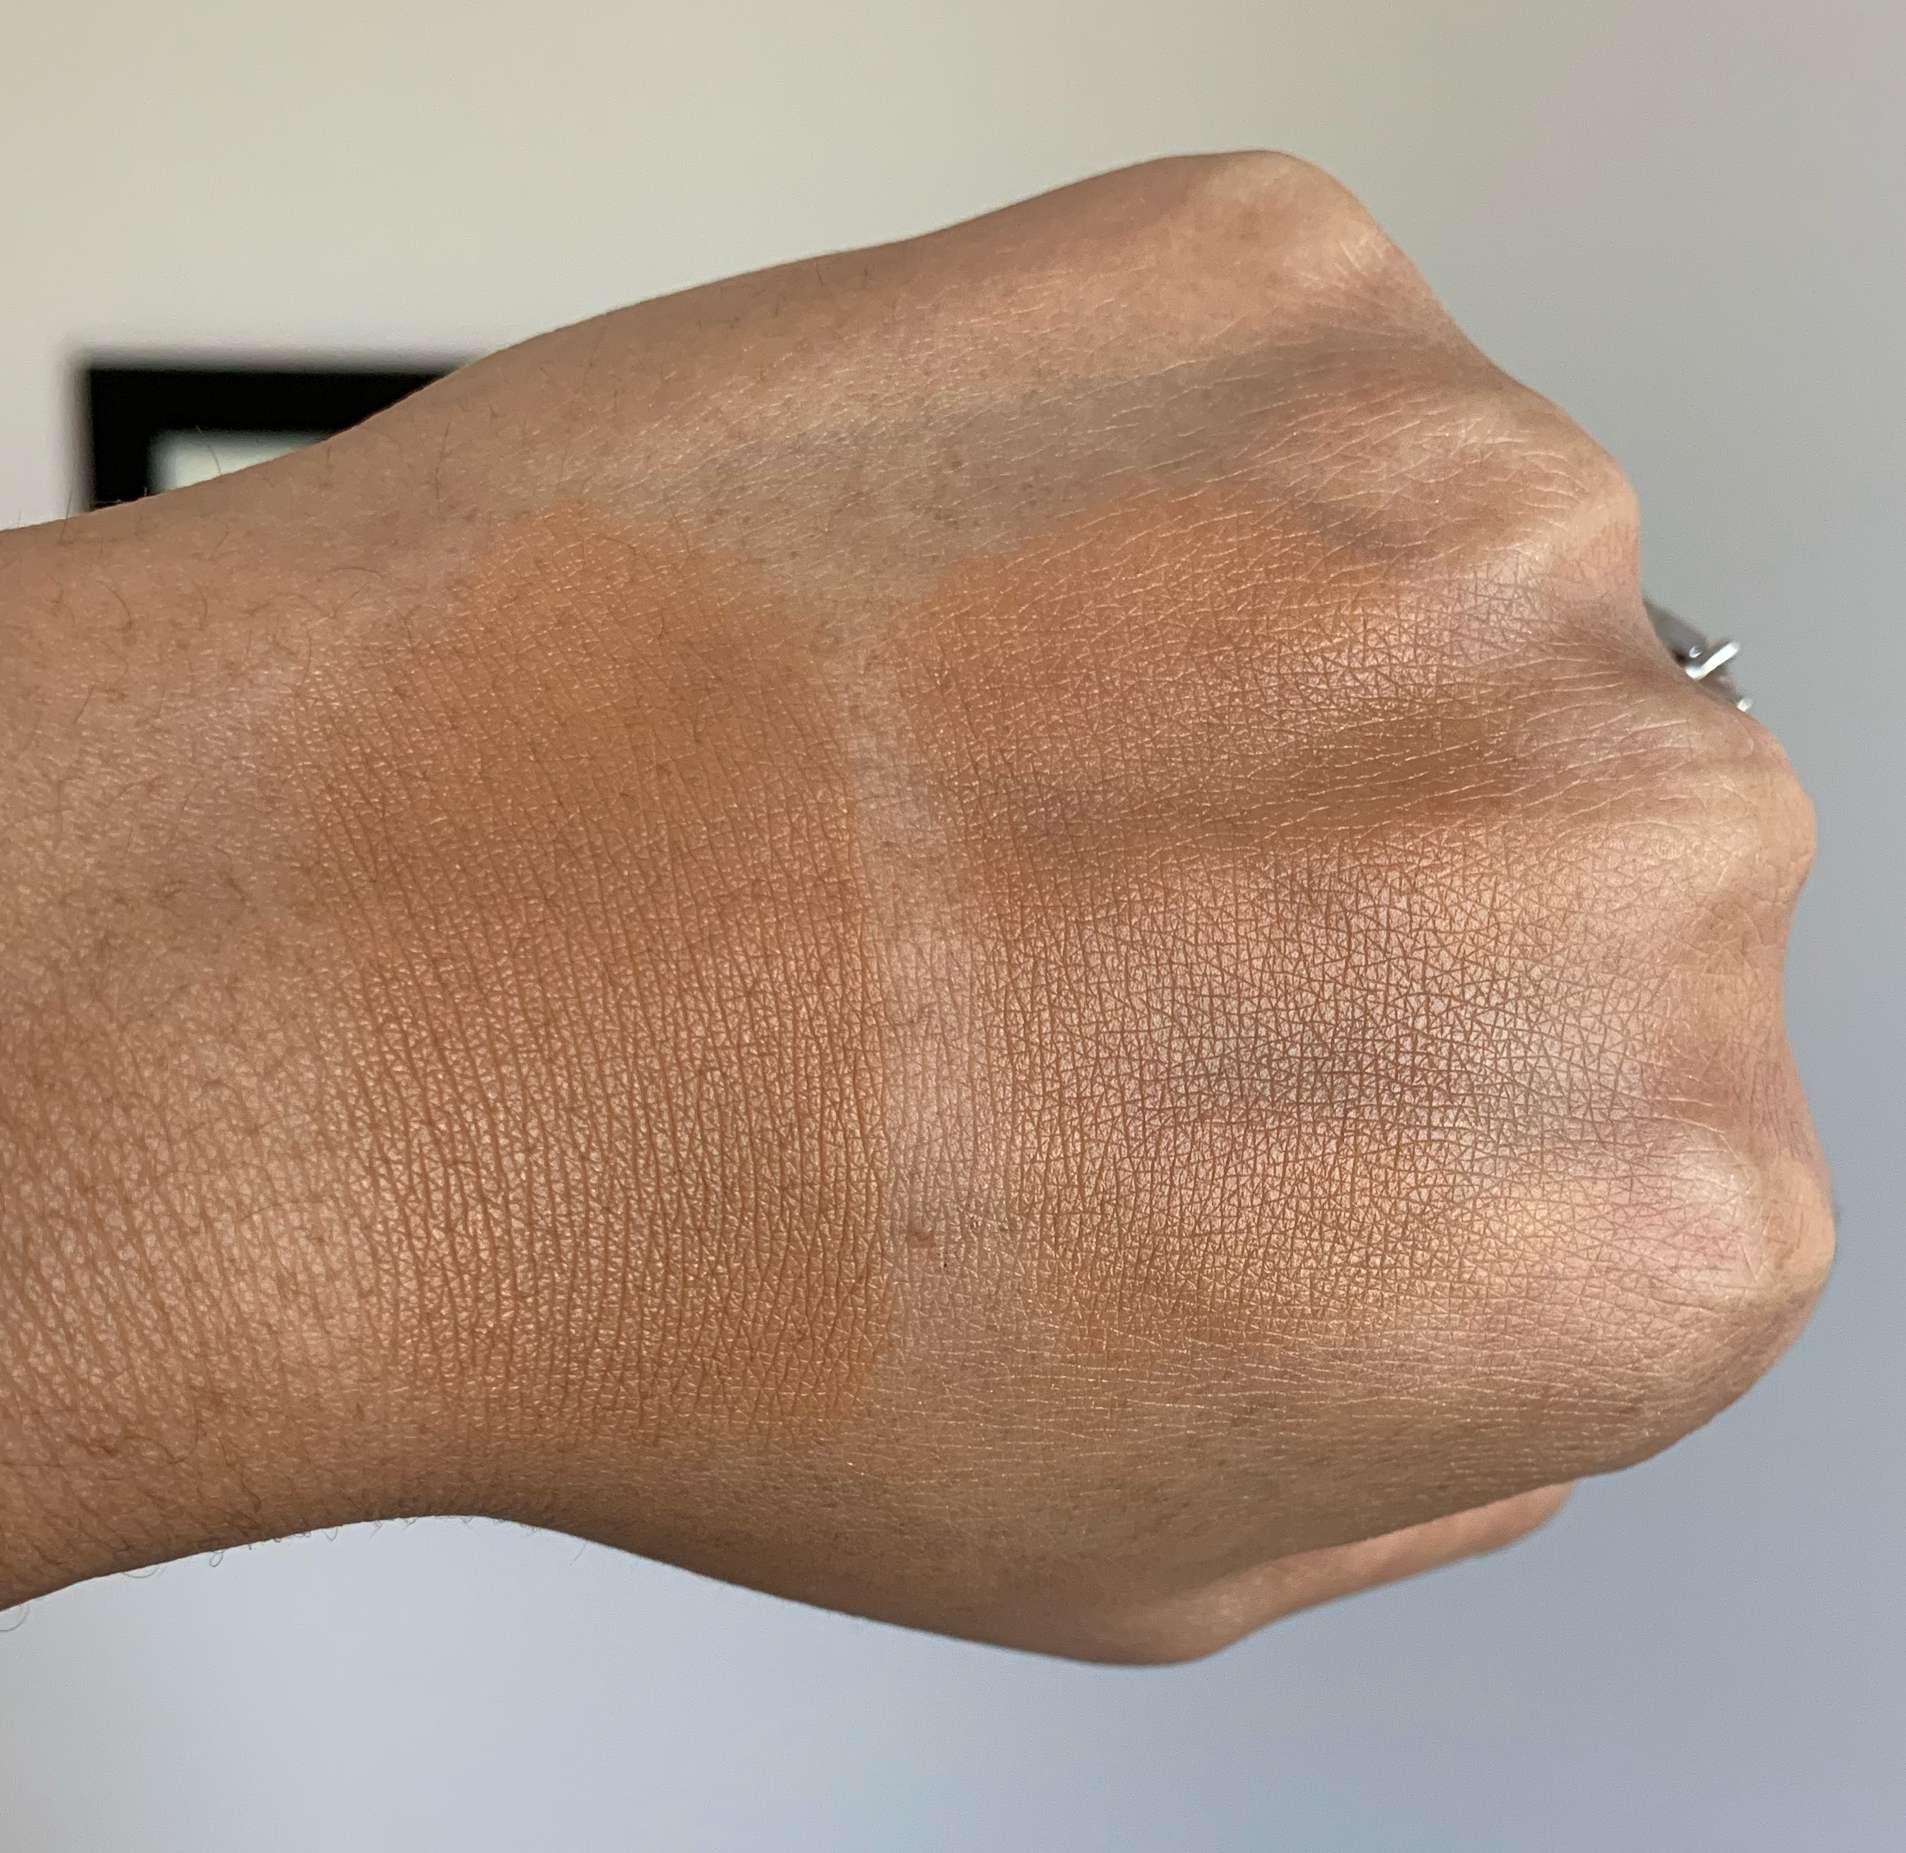 MAC Pro Longwear Concealer in NC45 (left) and Laura Mercier Flawless Fusion Ultra-Longwear Concealer in 5W (right) Swatches on Medium Dark Skin